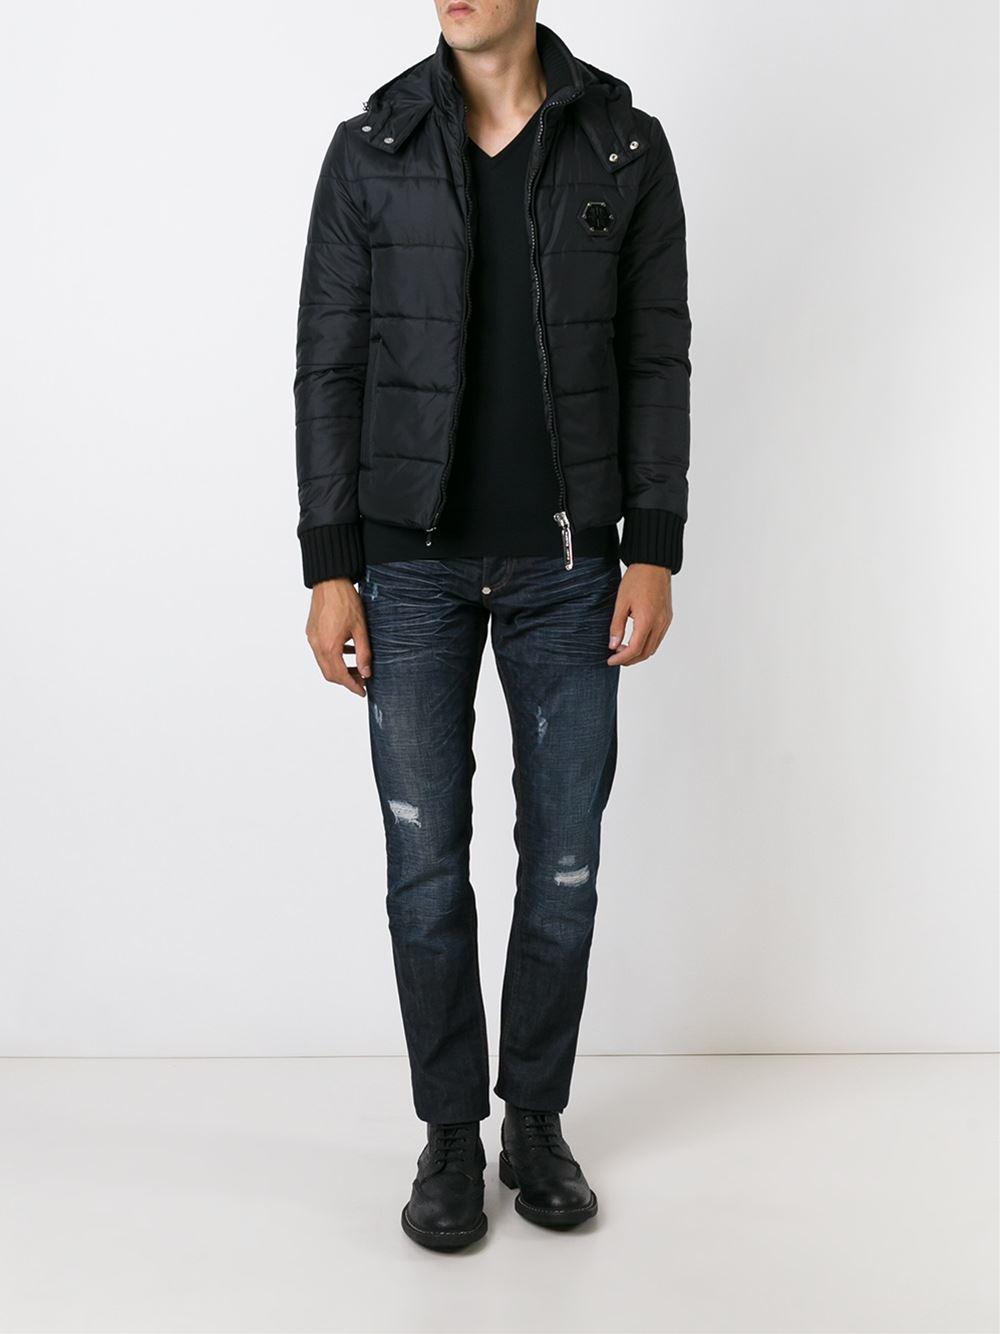 philipp plein 39 ingenius 39 padded jacket in black for men lyst. Black Bedroom Furniture Sets. Home Design Ideas